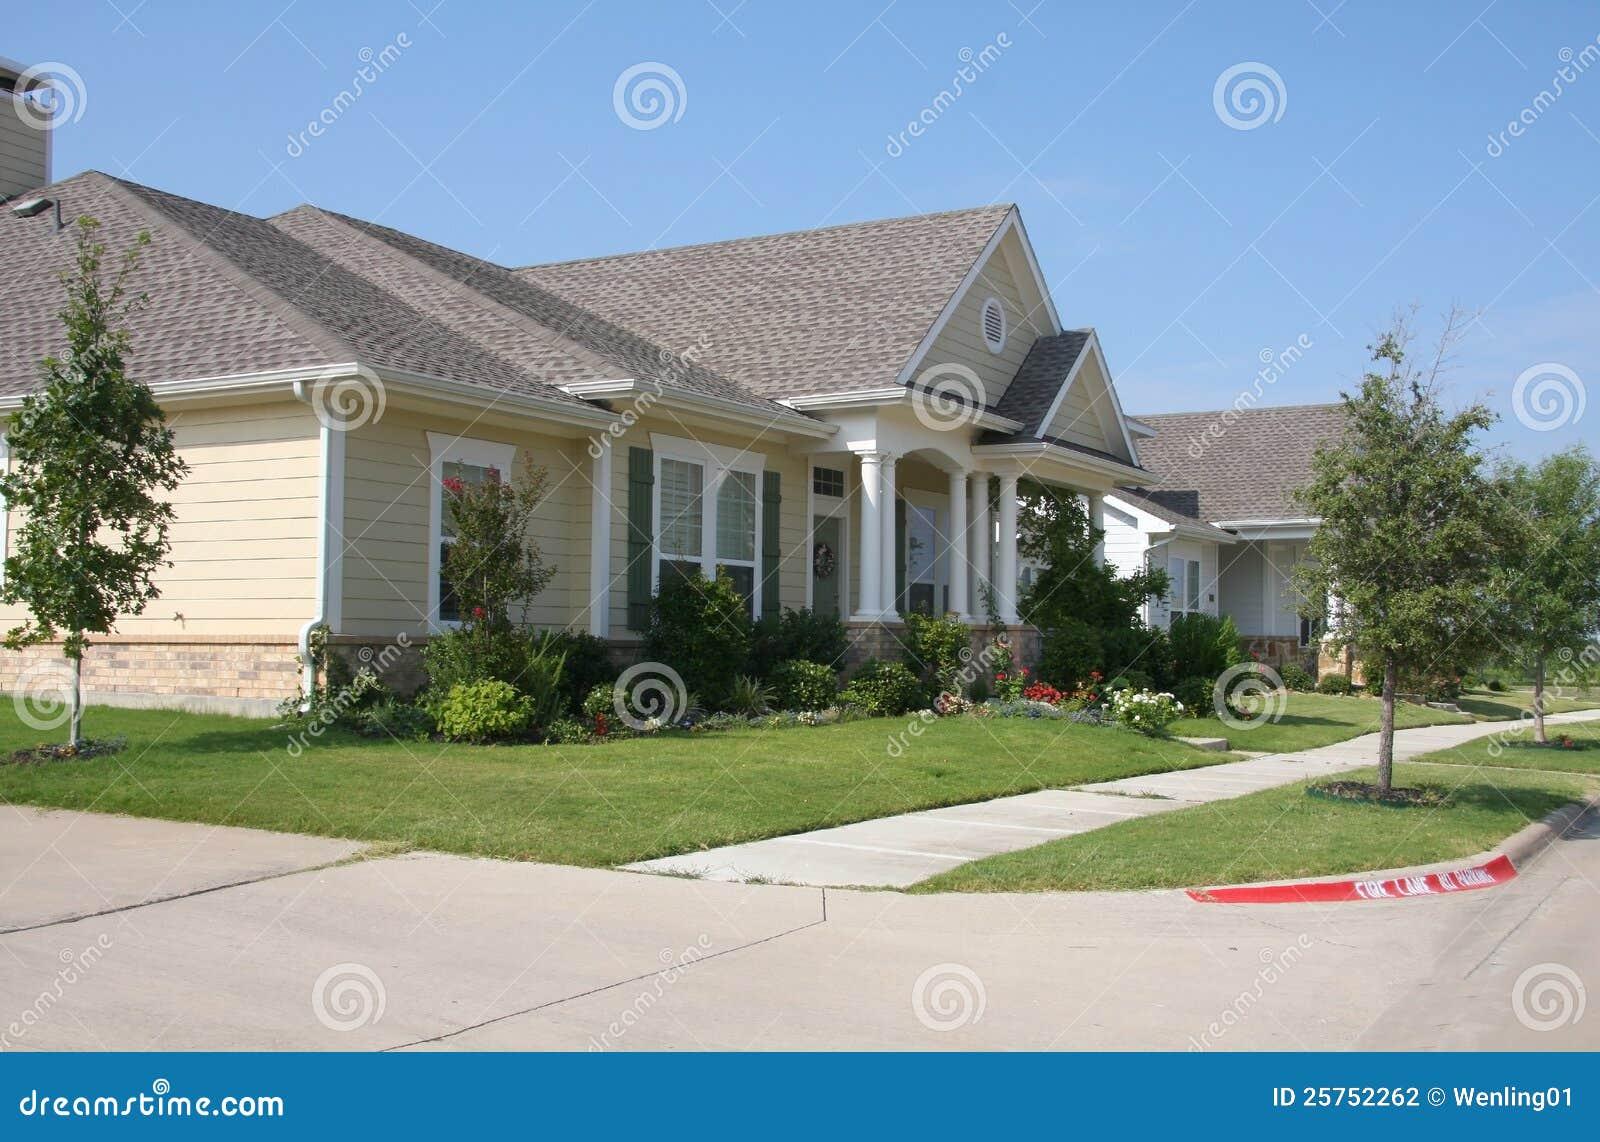 Gadern σπίτια αρκετά